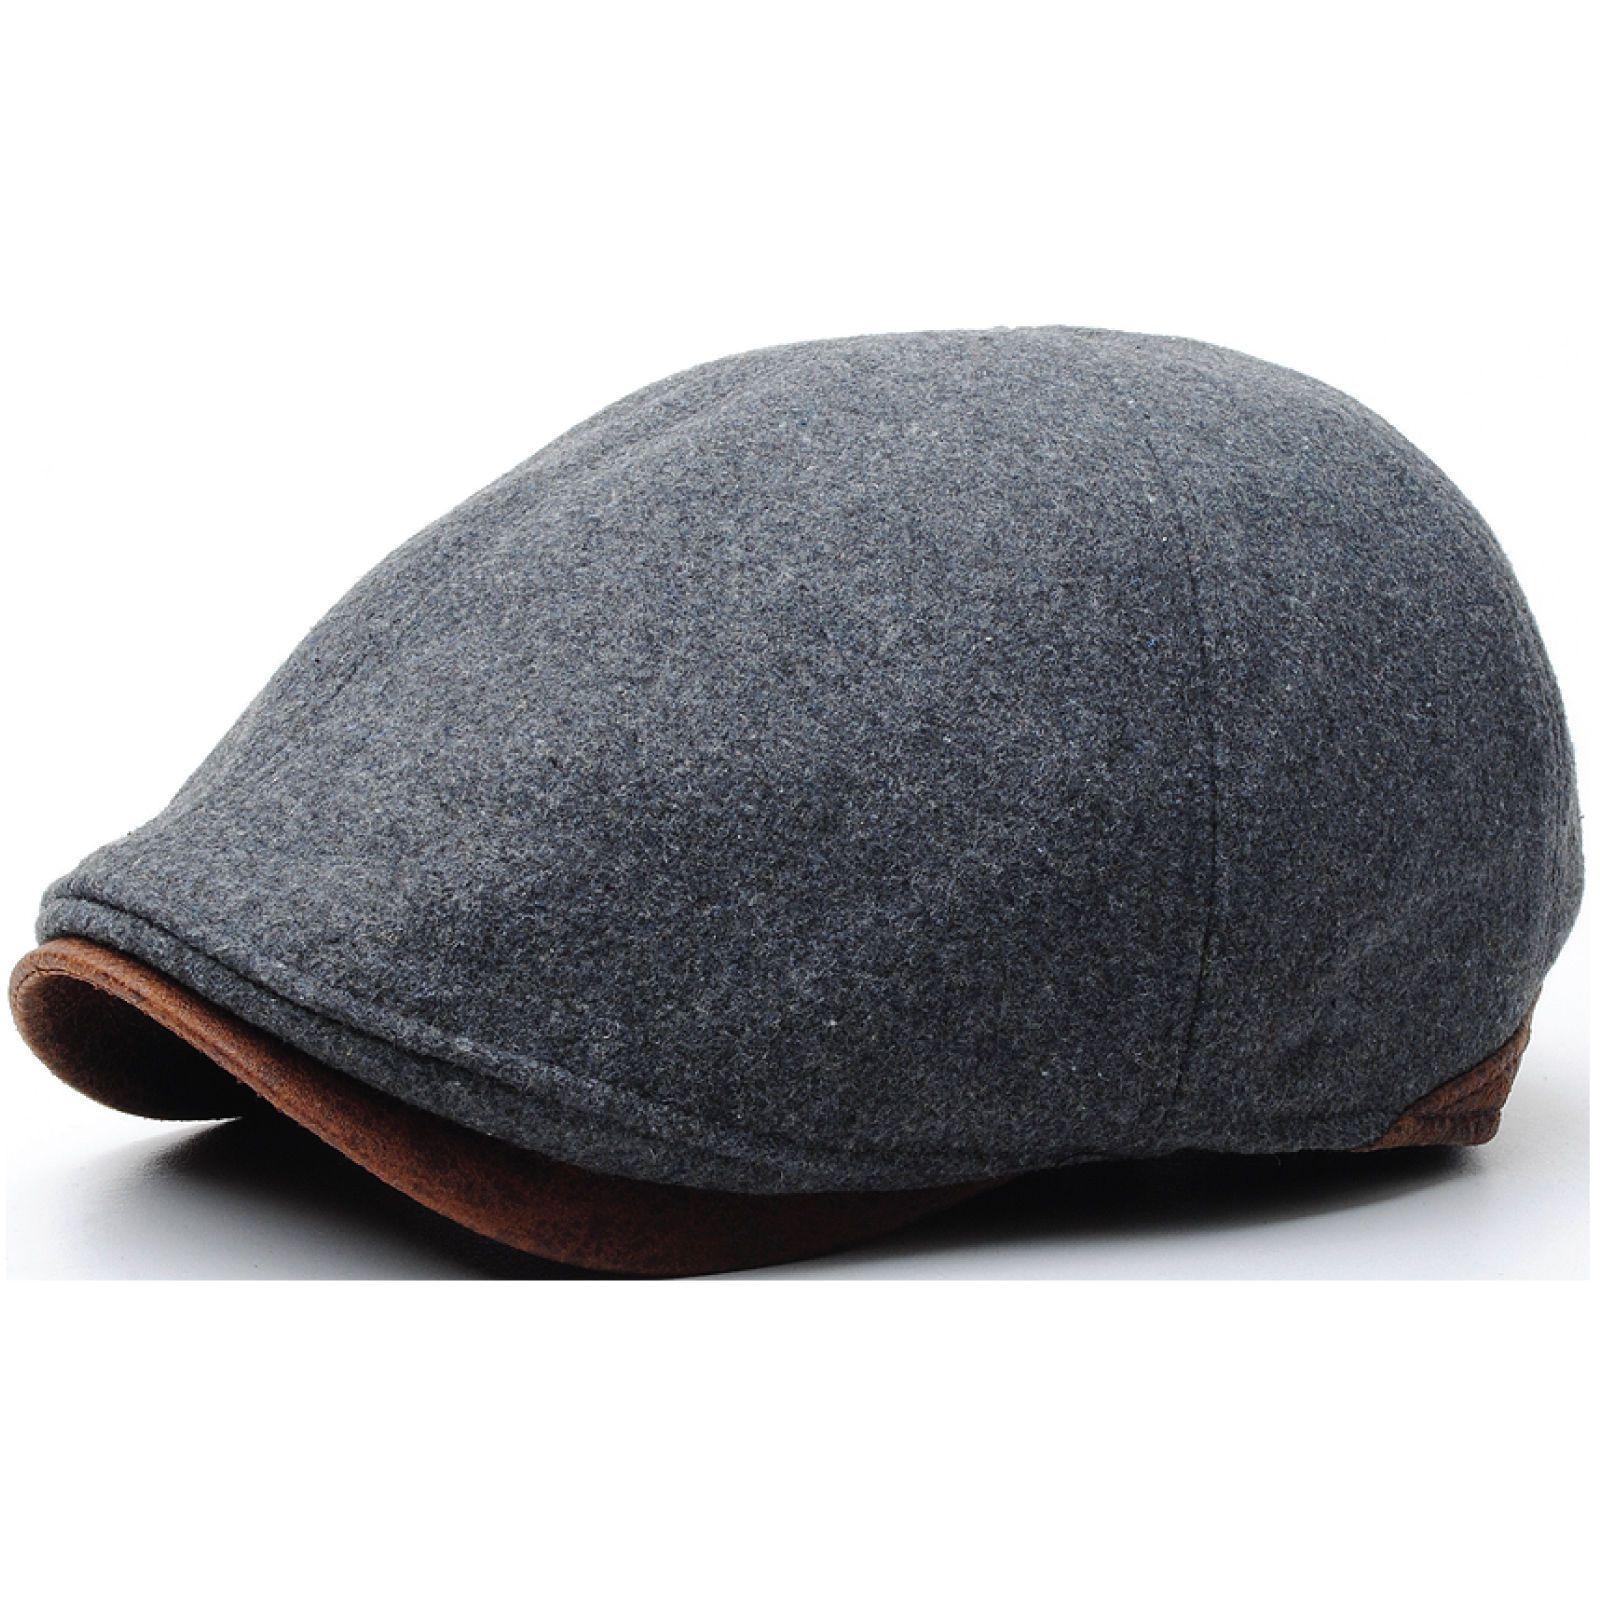 3438b06b9fc N07 Driving Wool Crack Faux Leather Style Ivy Cap Cabbie Ascot Newsboy  Beret Hat